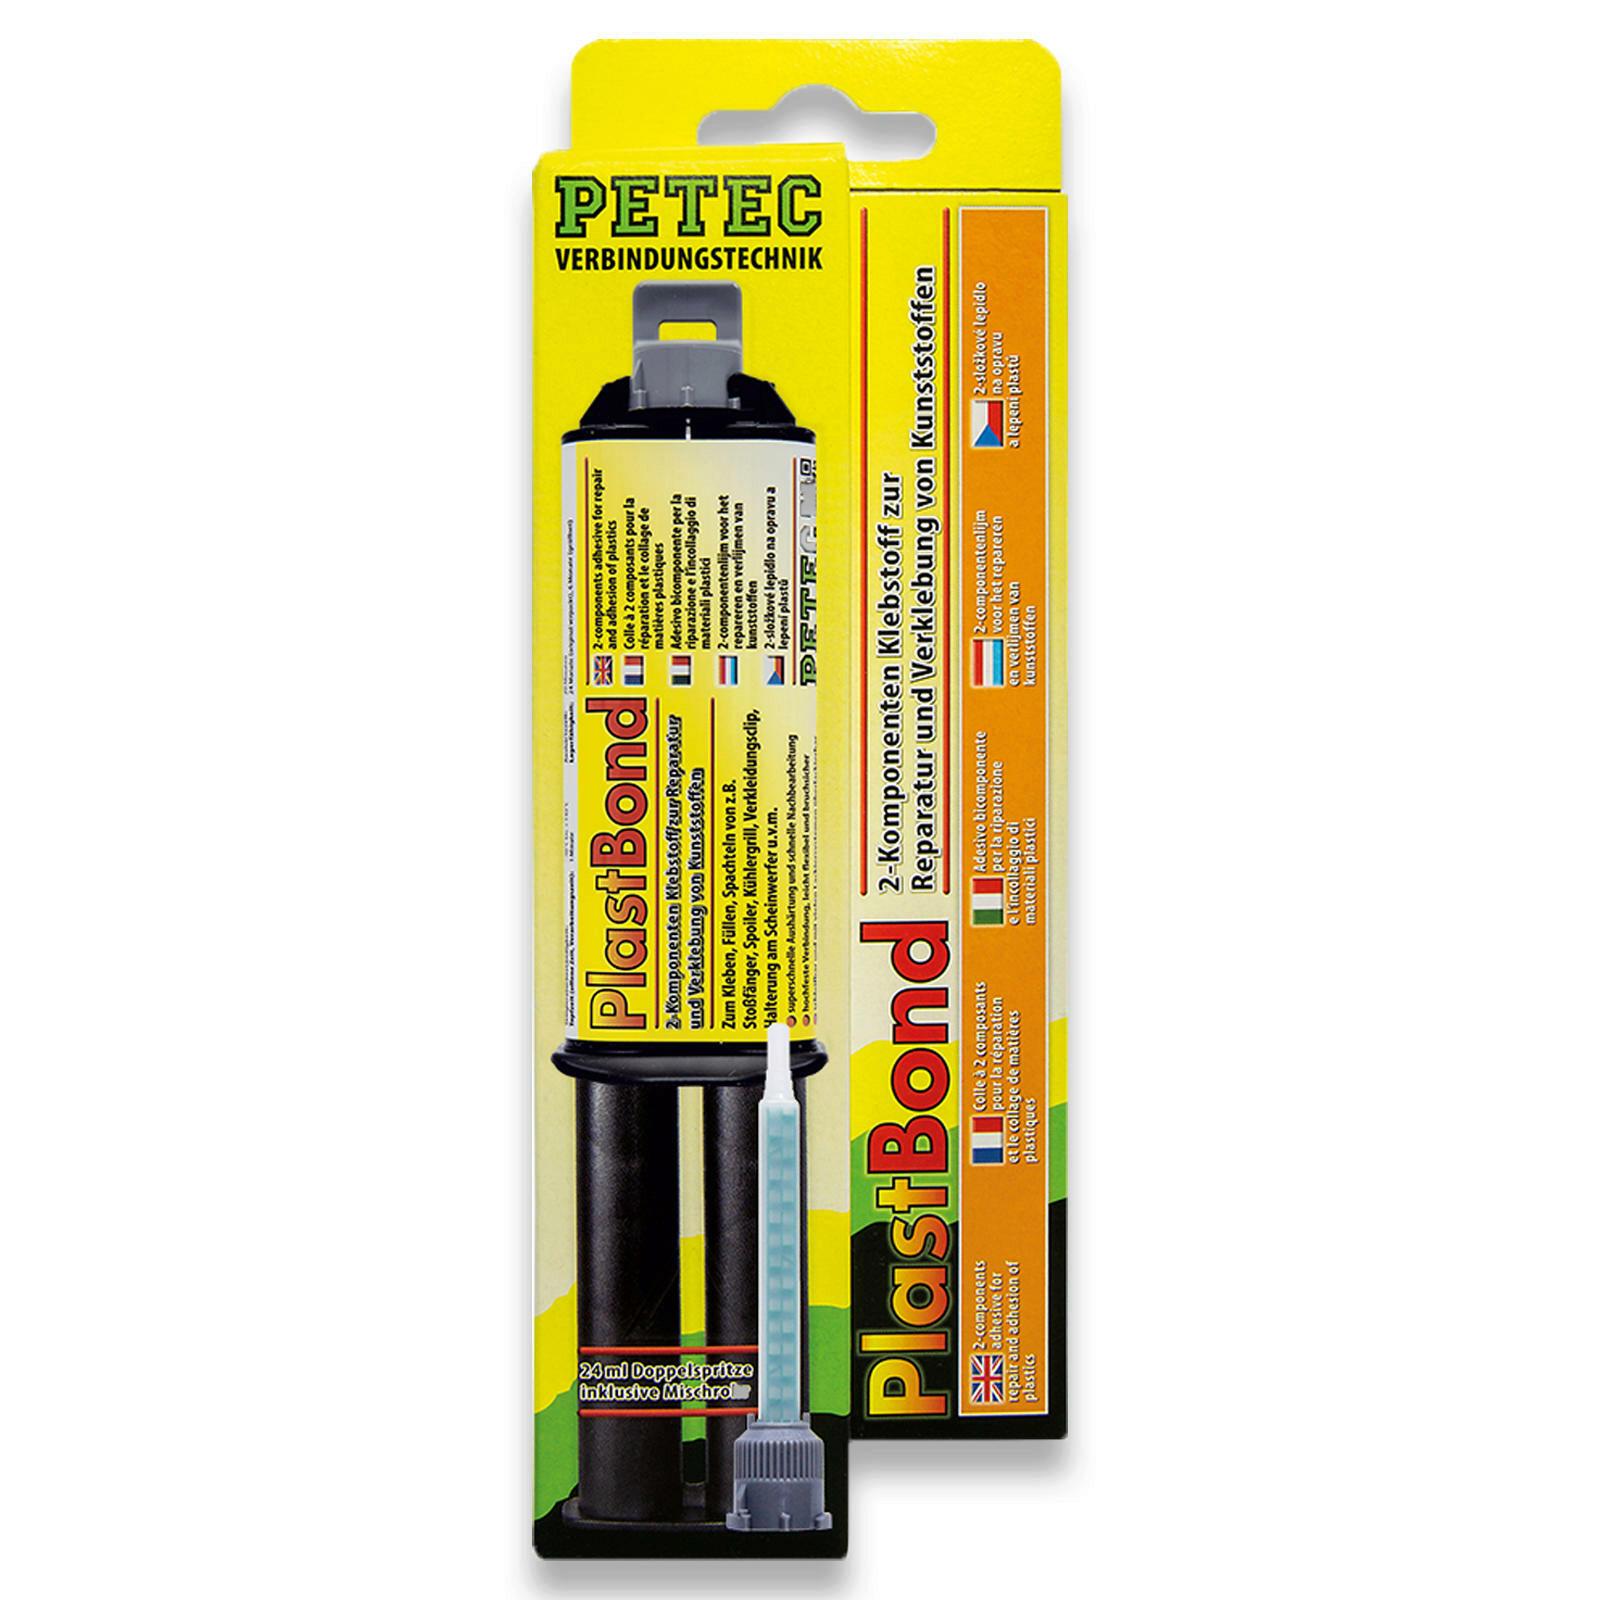 PETEC PlastBond 24ml 2-Komponenten-Kleber Schwarz